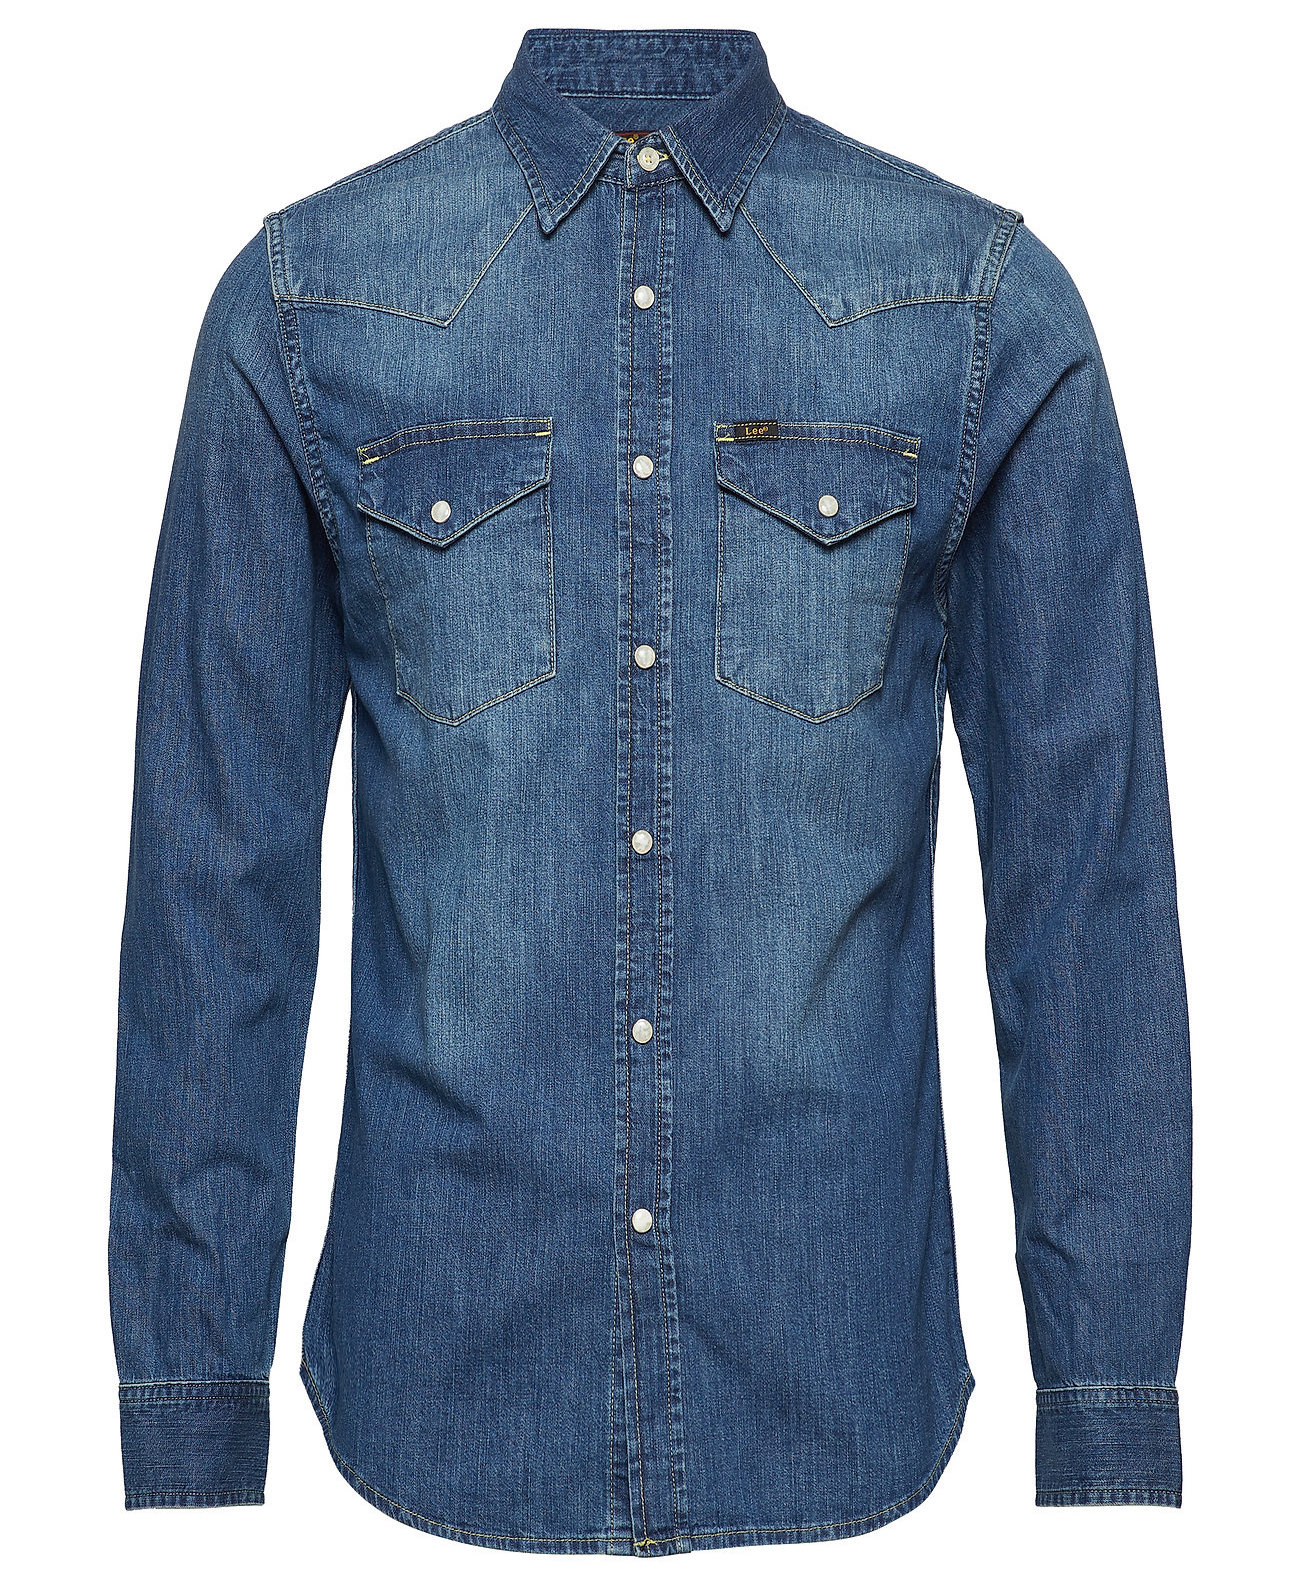 Lee 101 Rider spijkeroverhemd, blauw